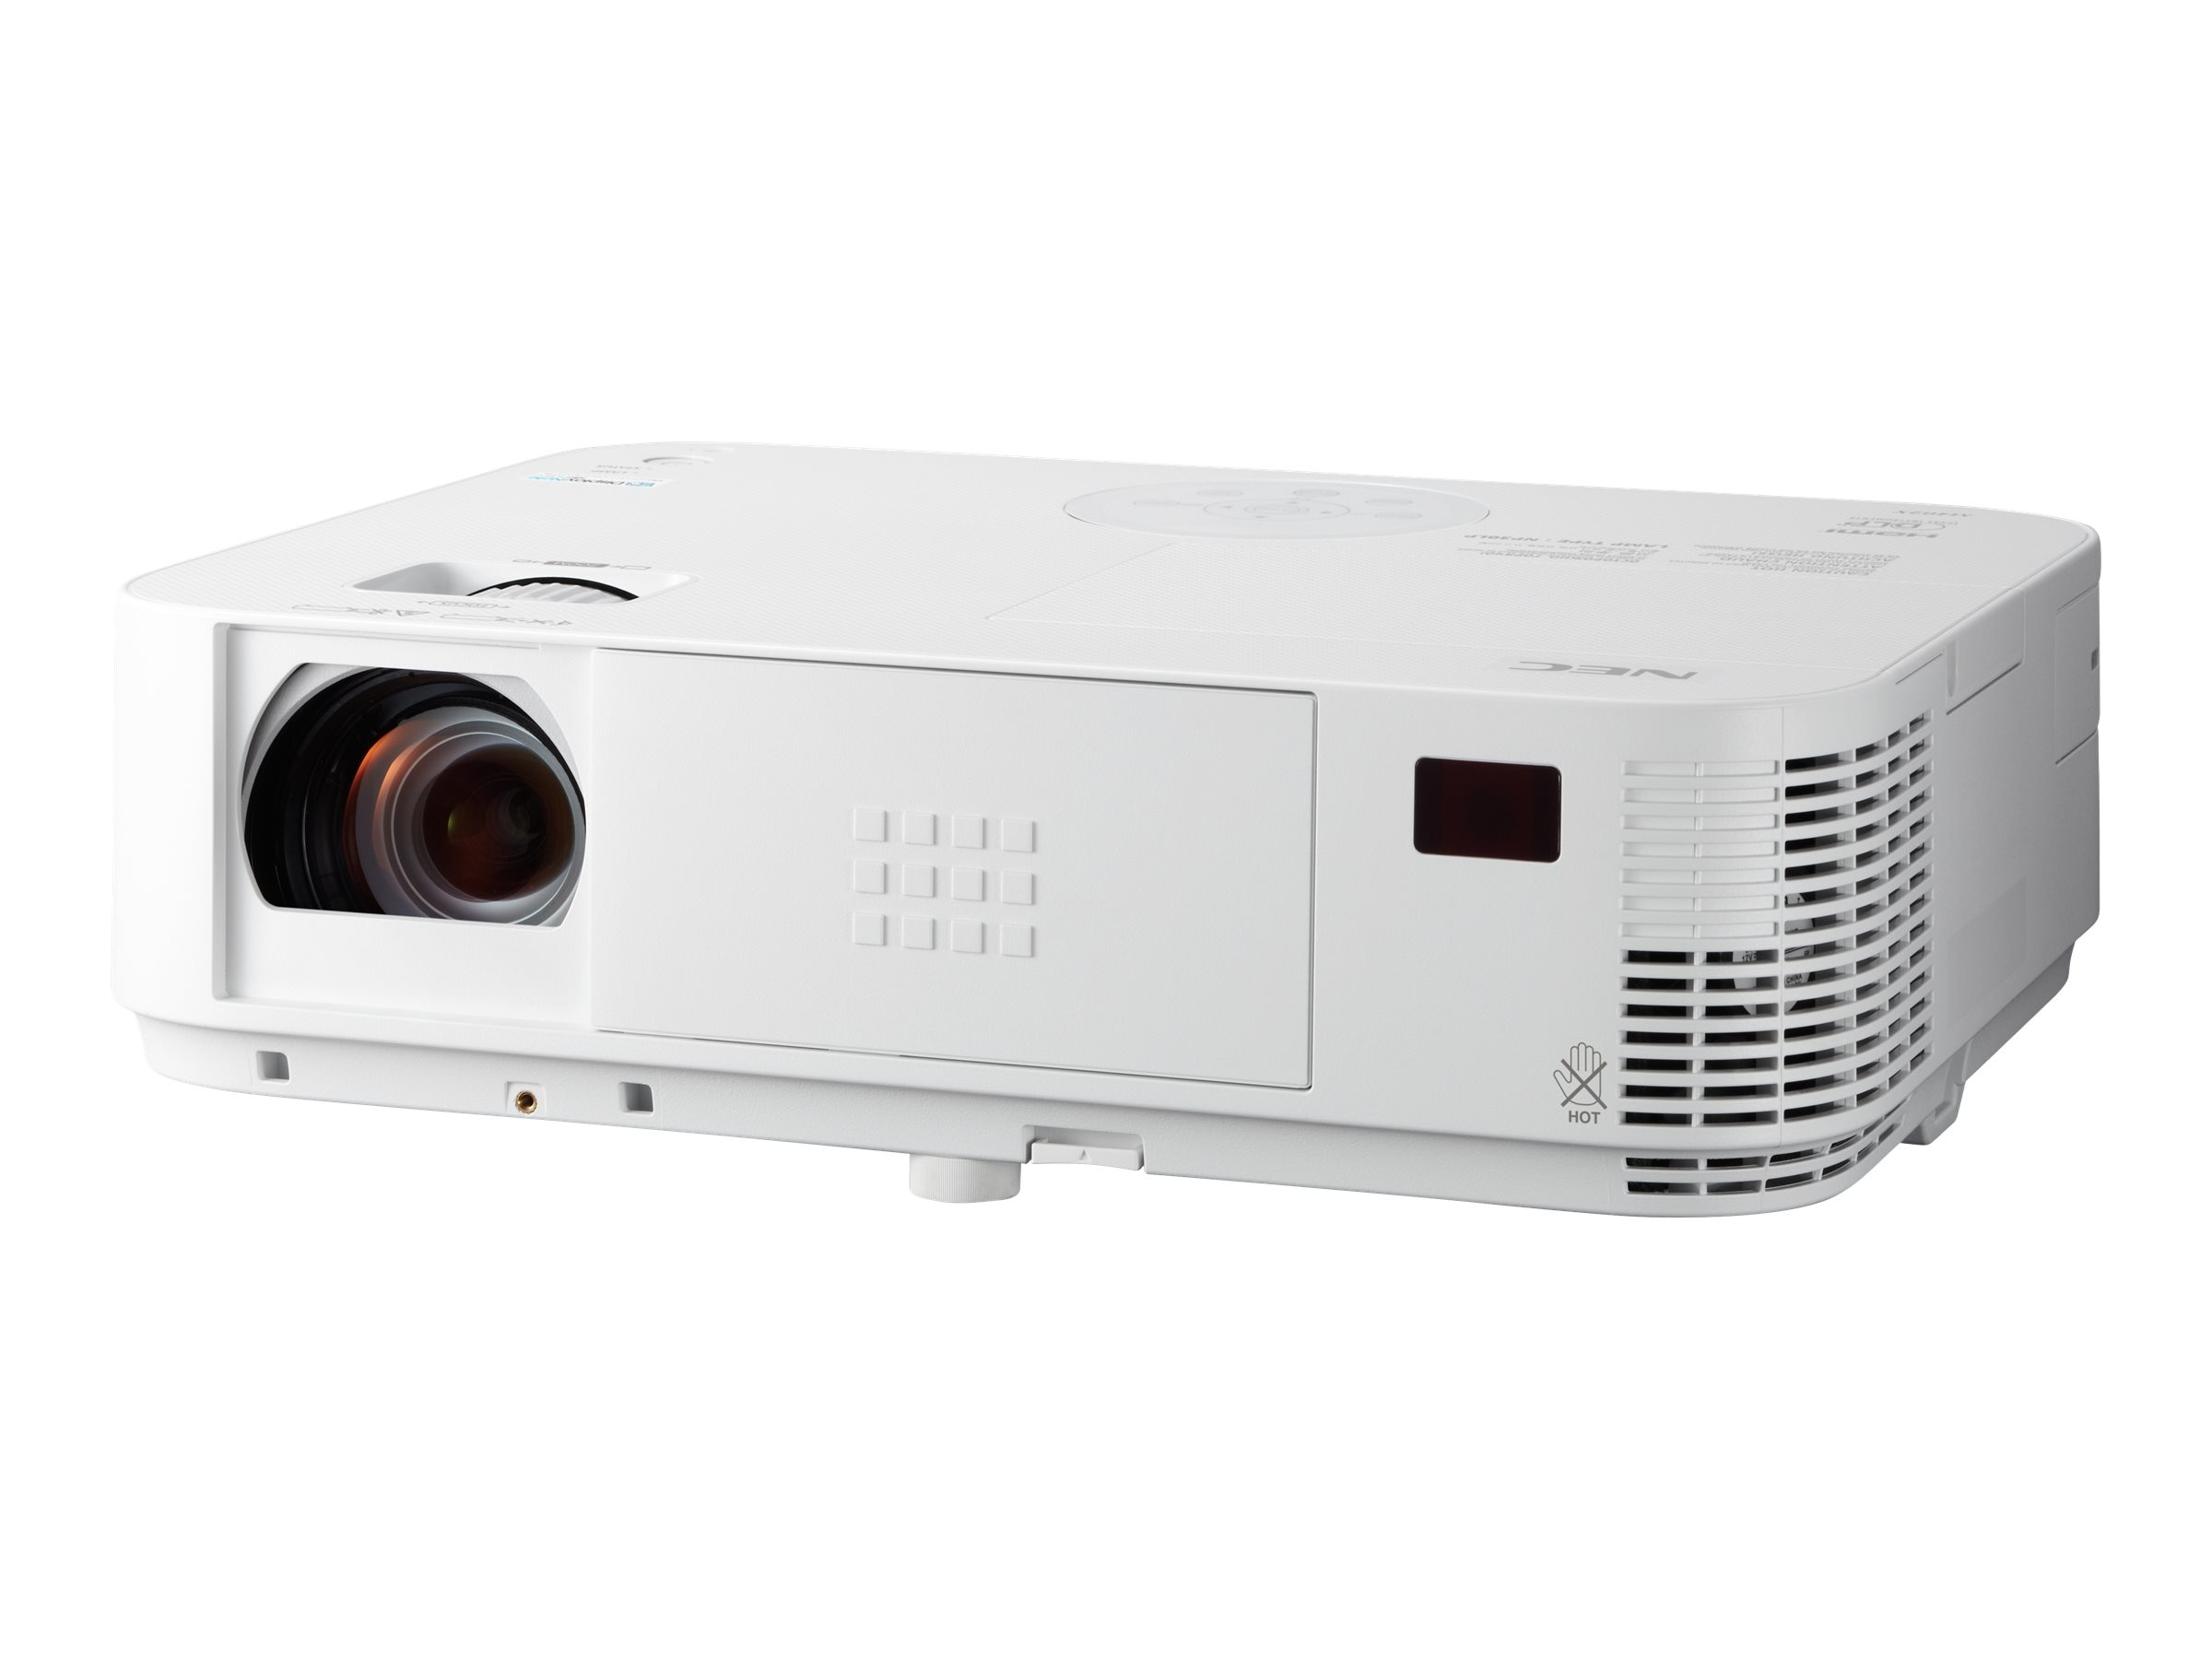 NEC M363W WXGA 3D DLP Projector, 3600 Lumens, White